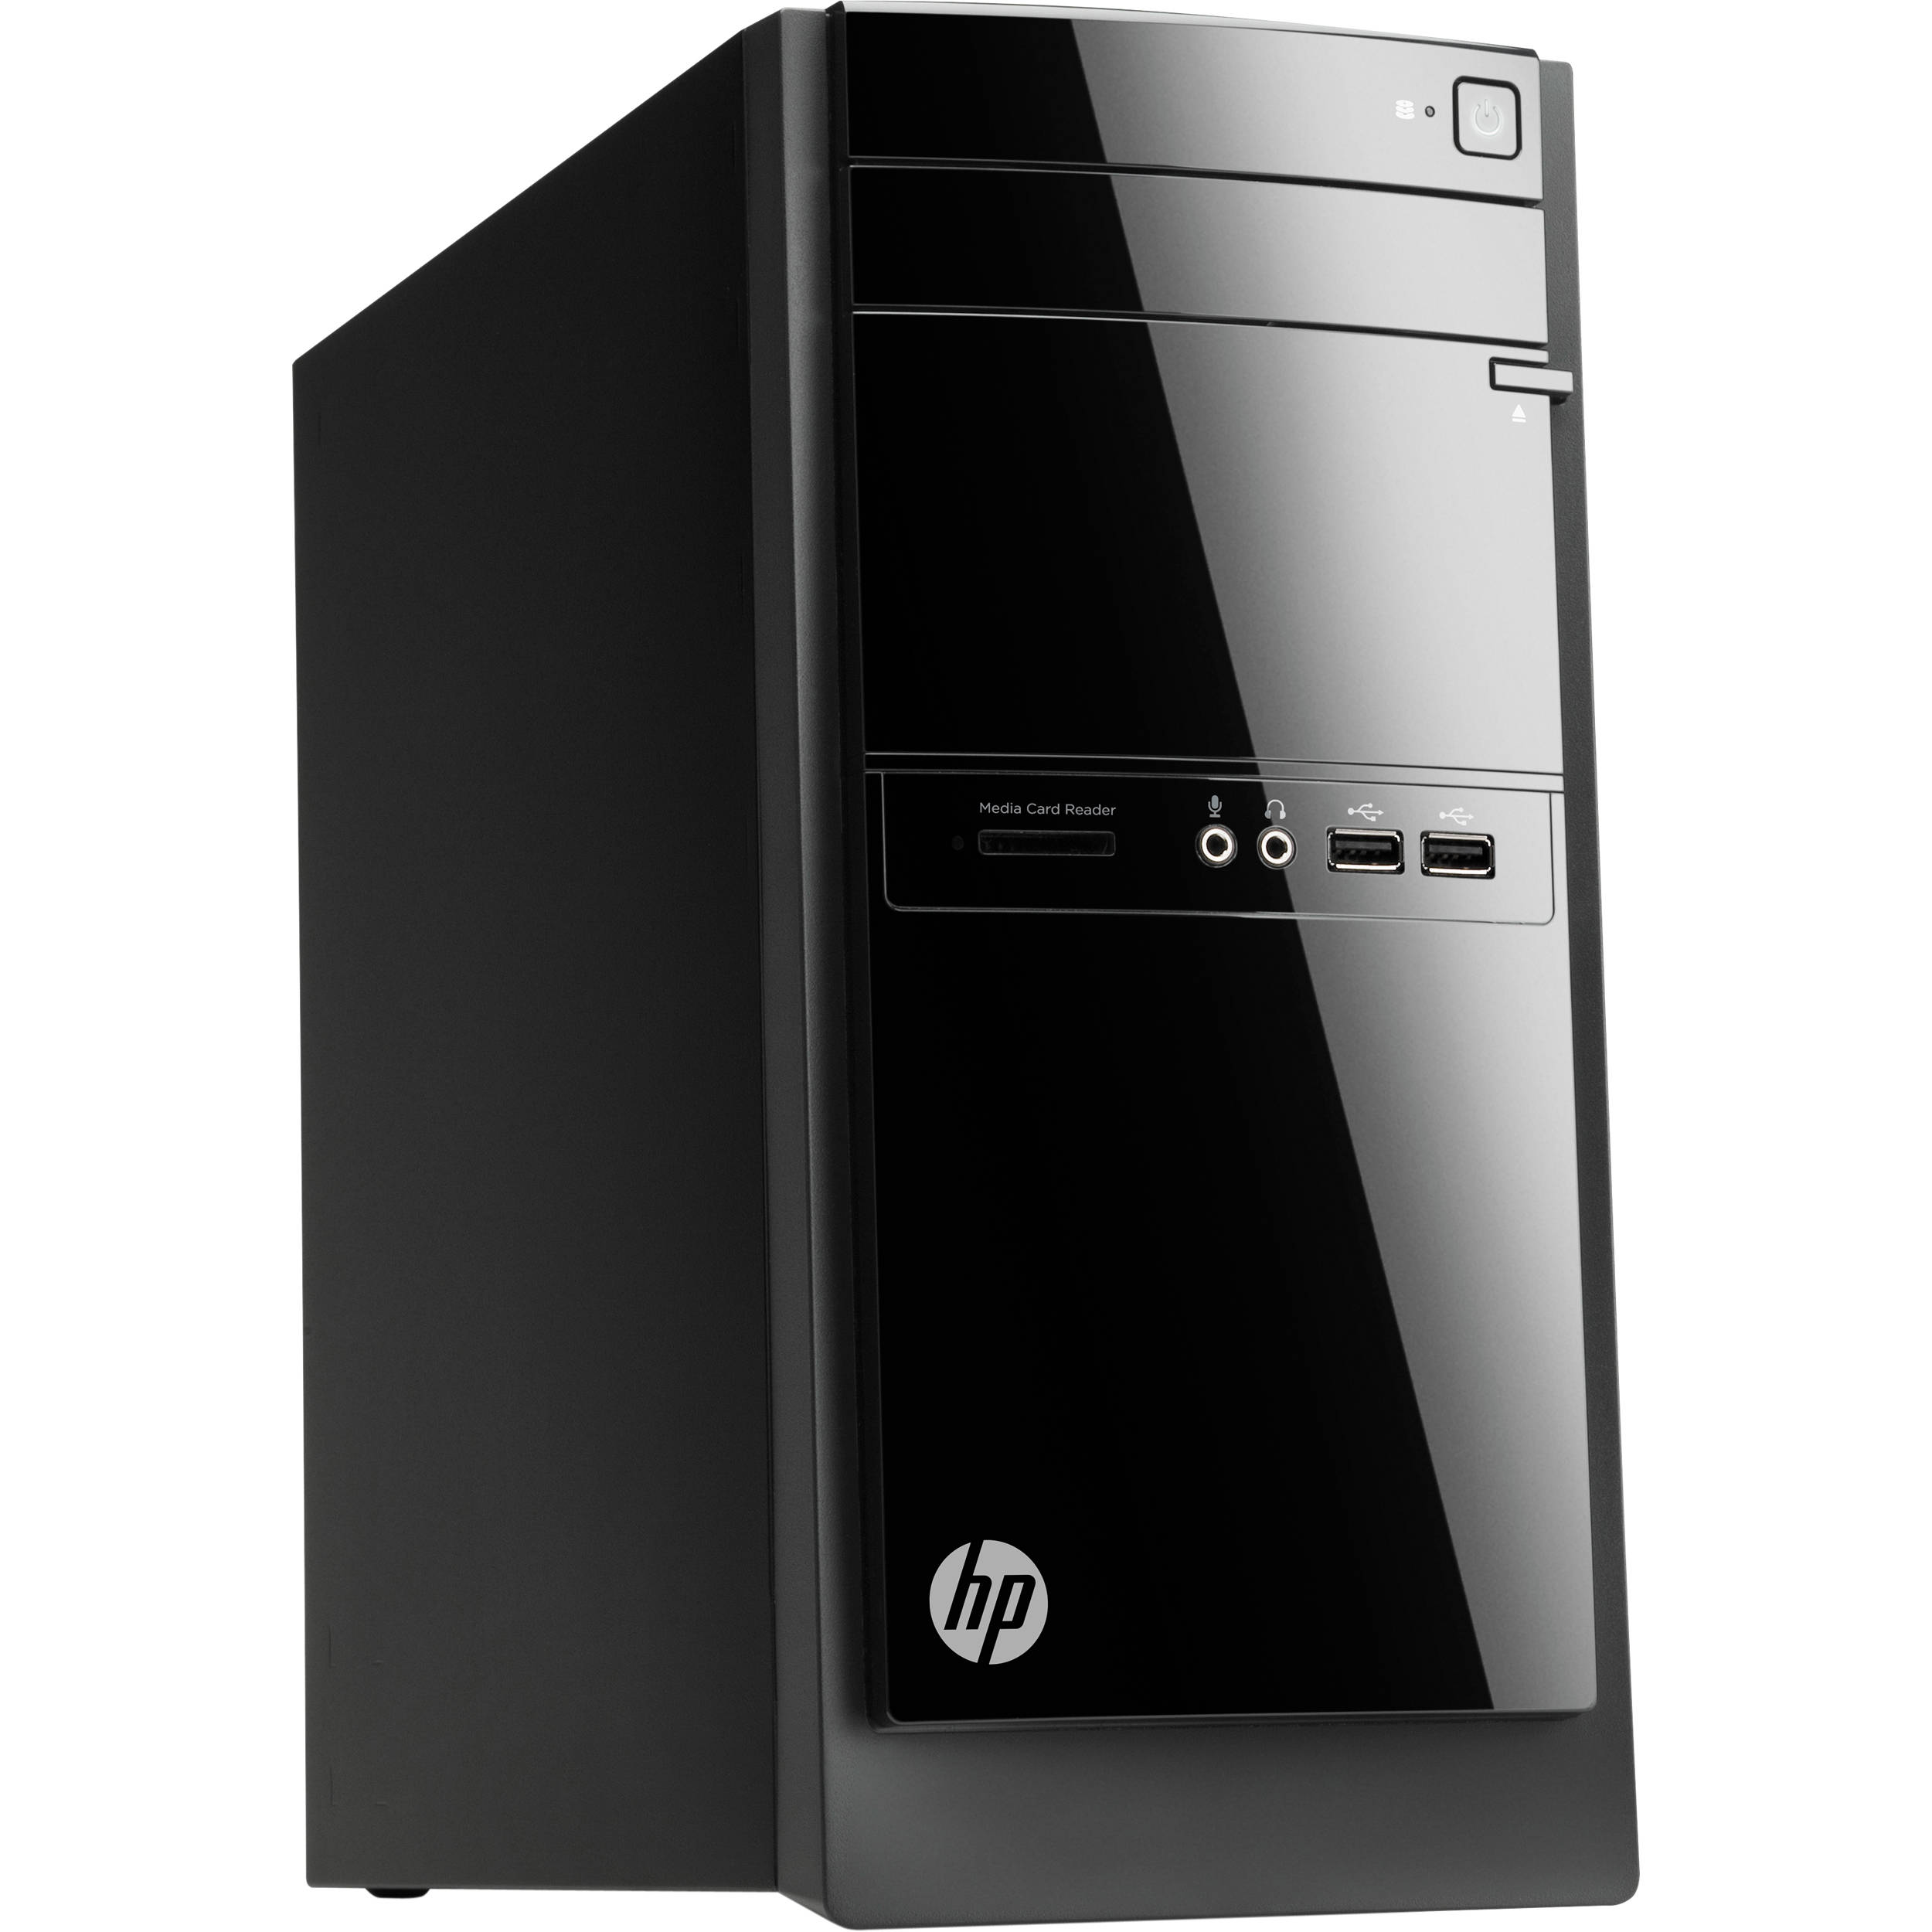 Hp 110 210 Desktop Computer F3d15aa Aba B Amp H Photo Video